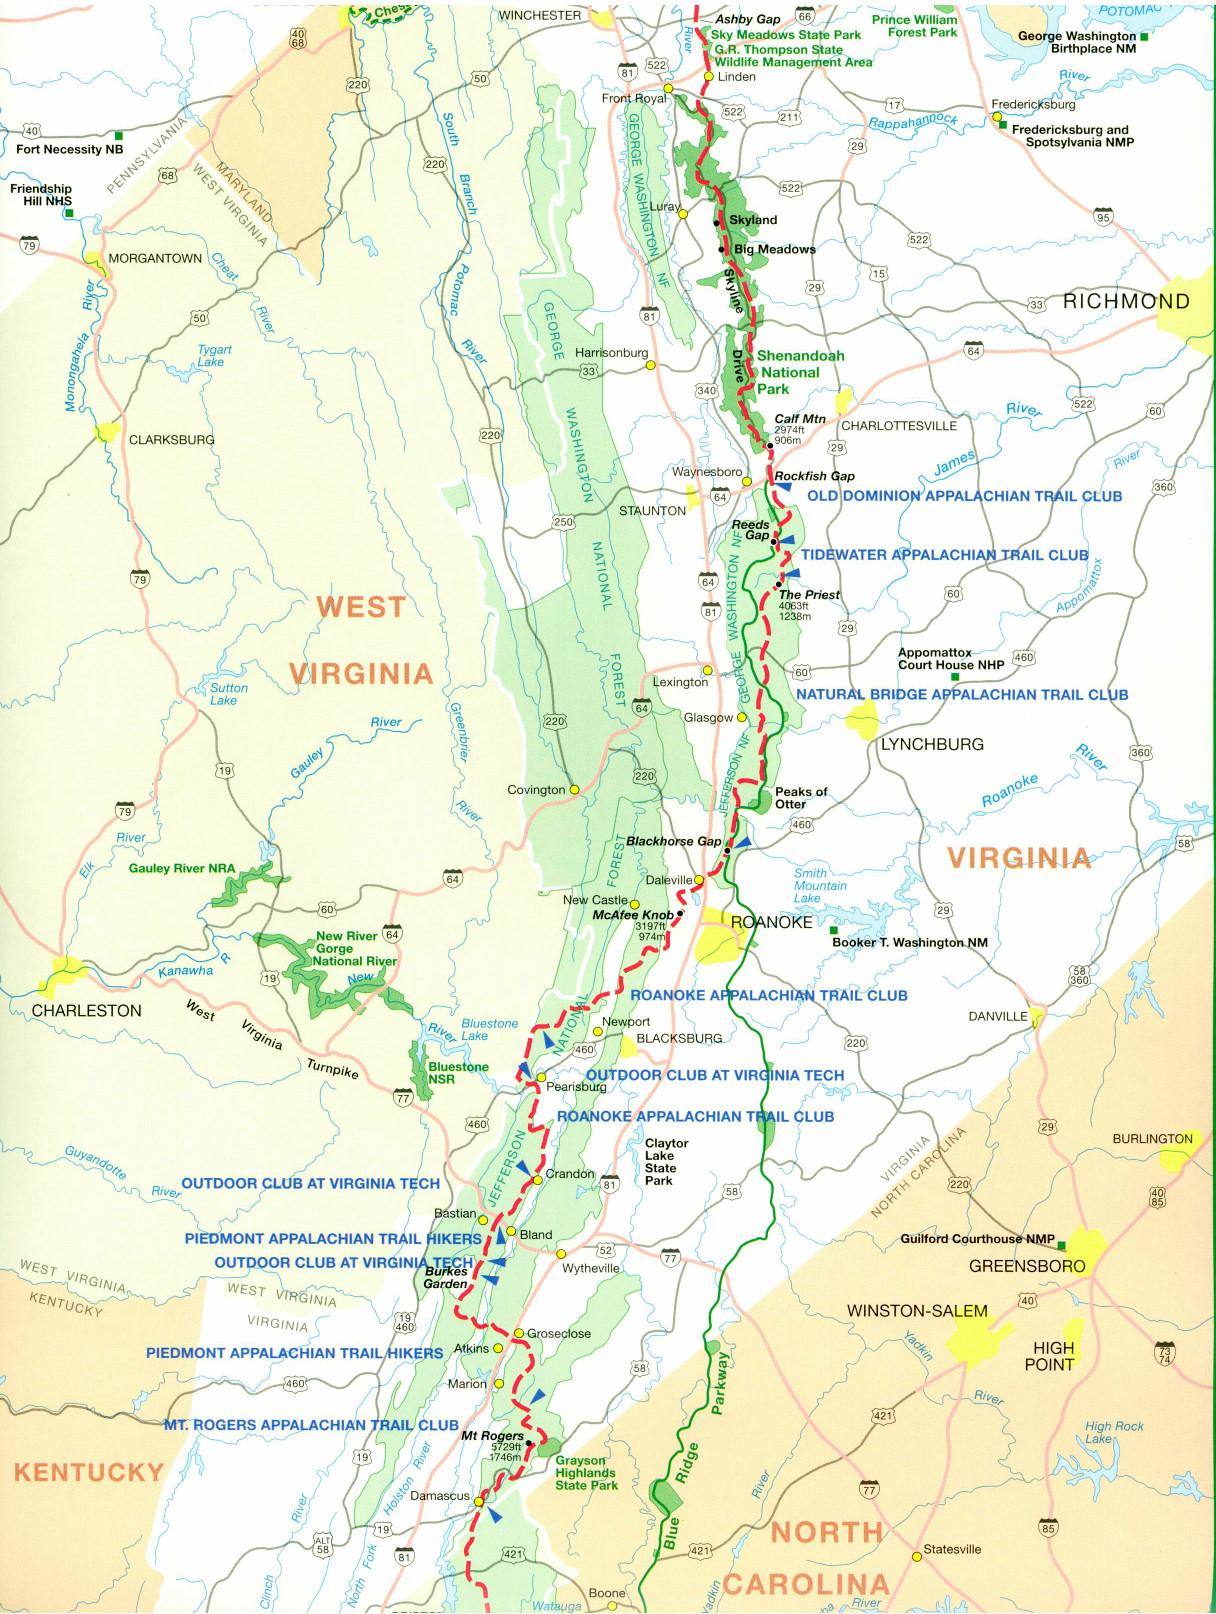 Virginia Appalachian Trail | AppalachianTrailTravelGuide.com